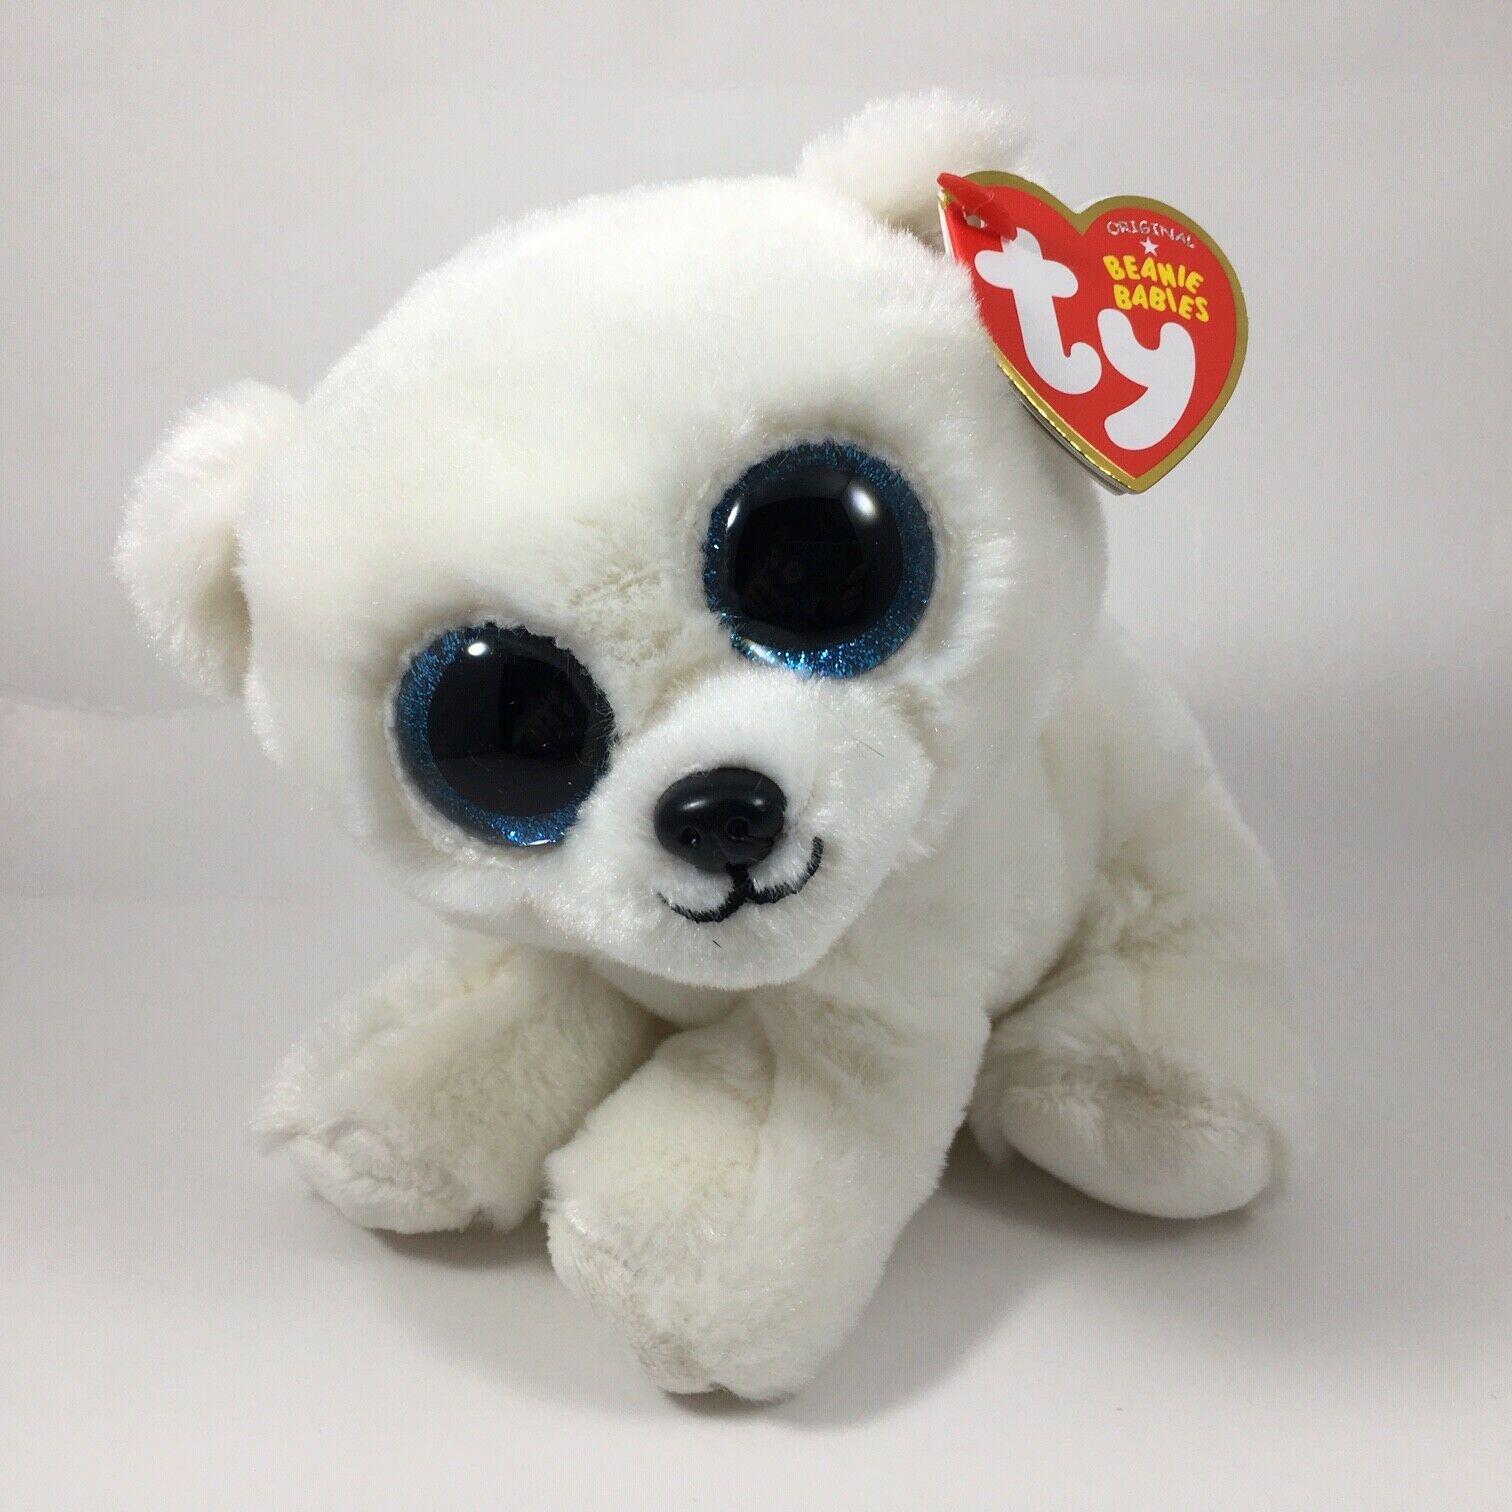 Predownload: New 2020 Ty Beanie Baby 6 Ari White Polar Bear Stuffed Animal Plush Toy Mwmts 8421401734 Ebay Polar Bear Plush Ty Stuffed Animals Bear Stuffed Animal [ 1512 x 1512 Pixel ]